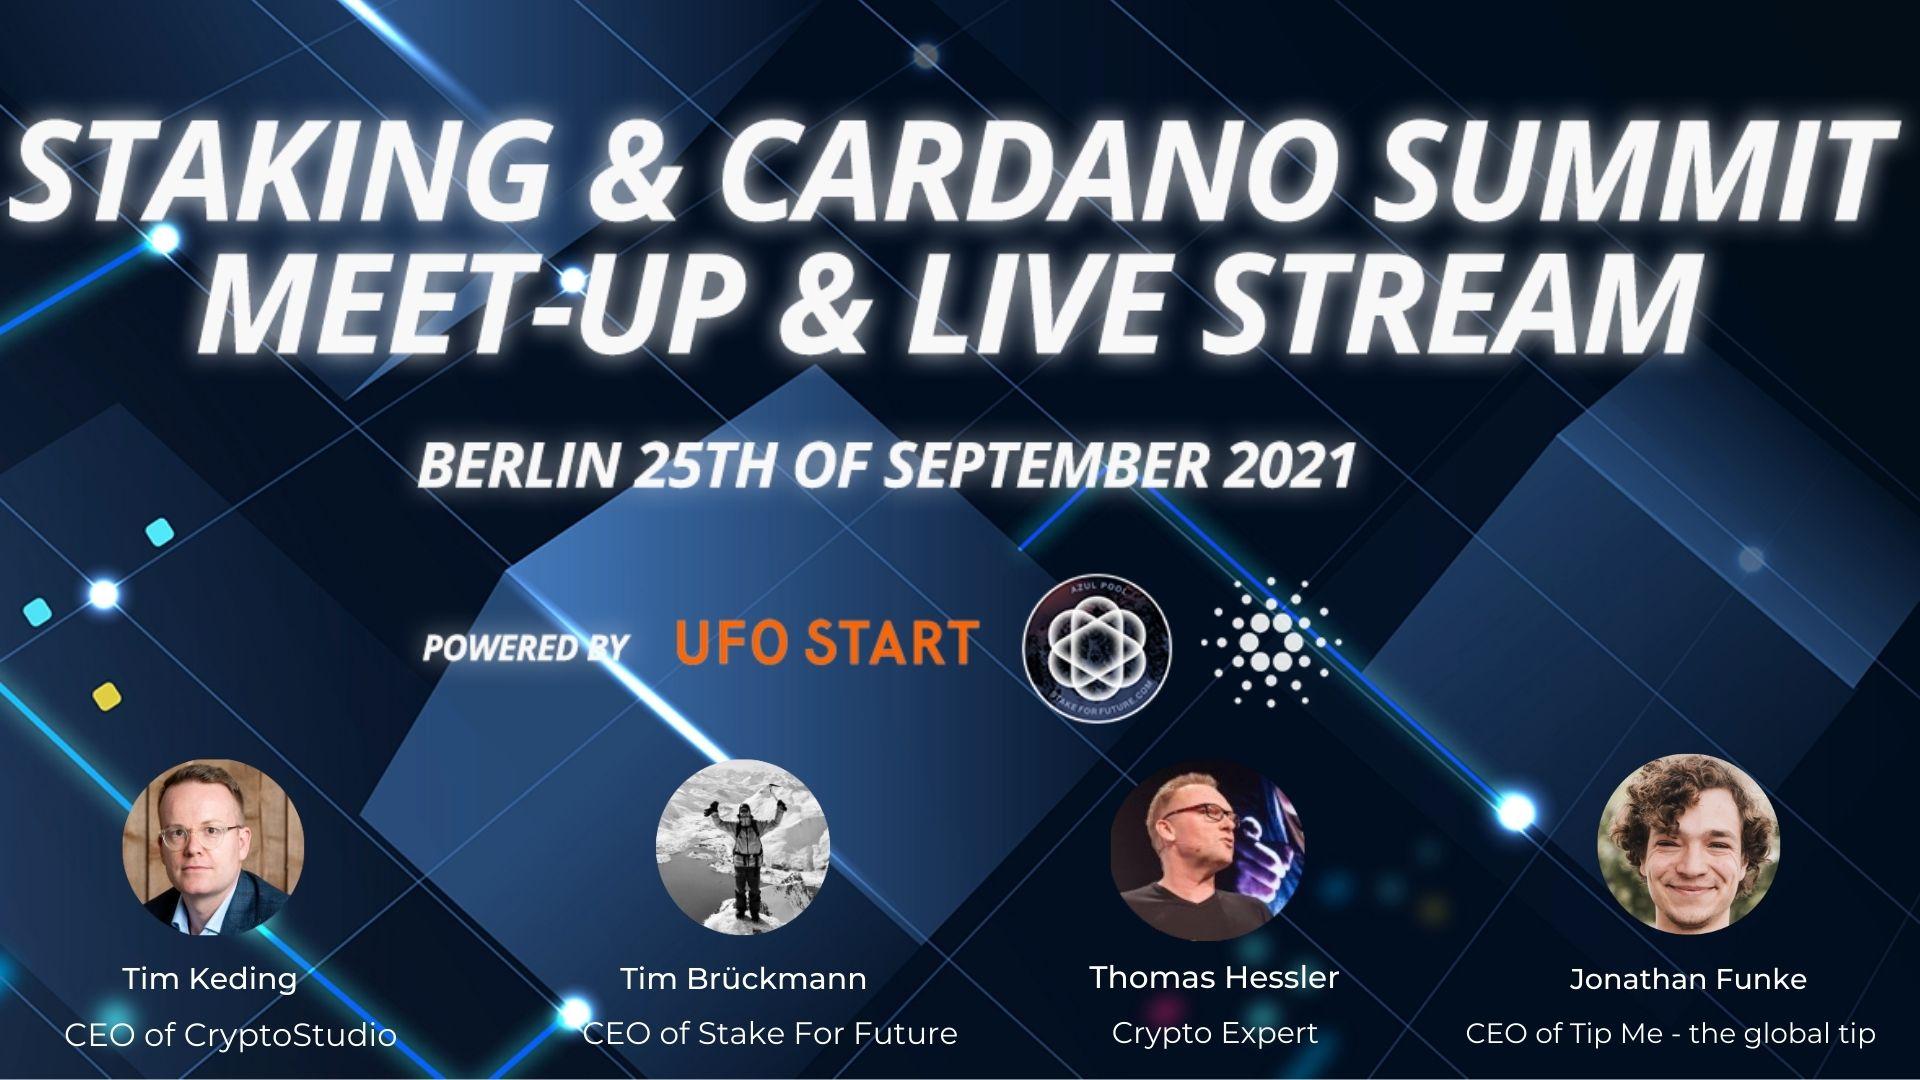 Staking & Cardano Summit